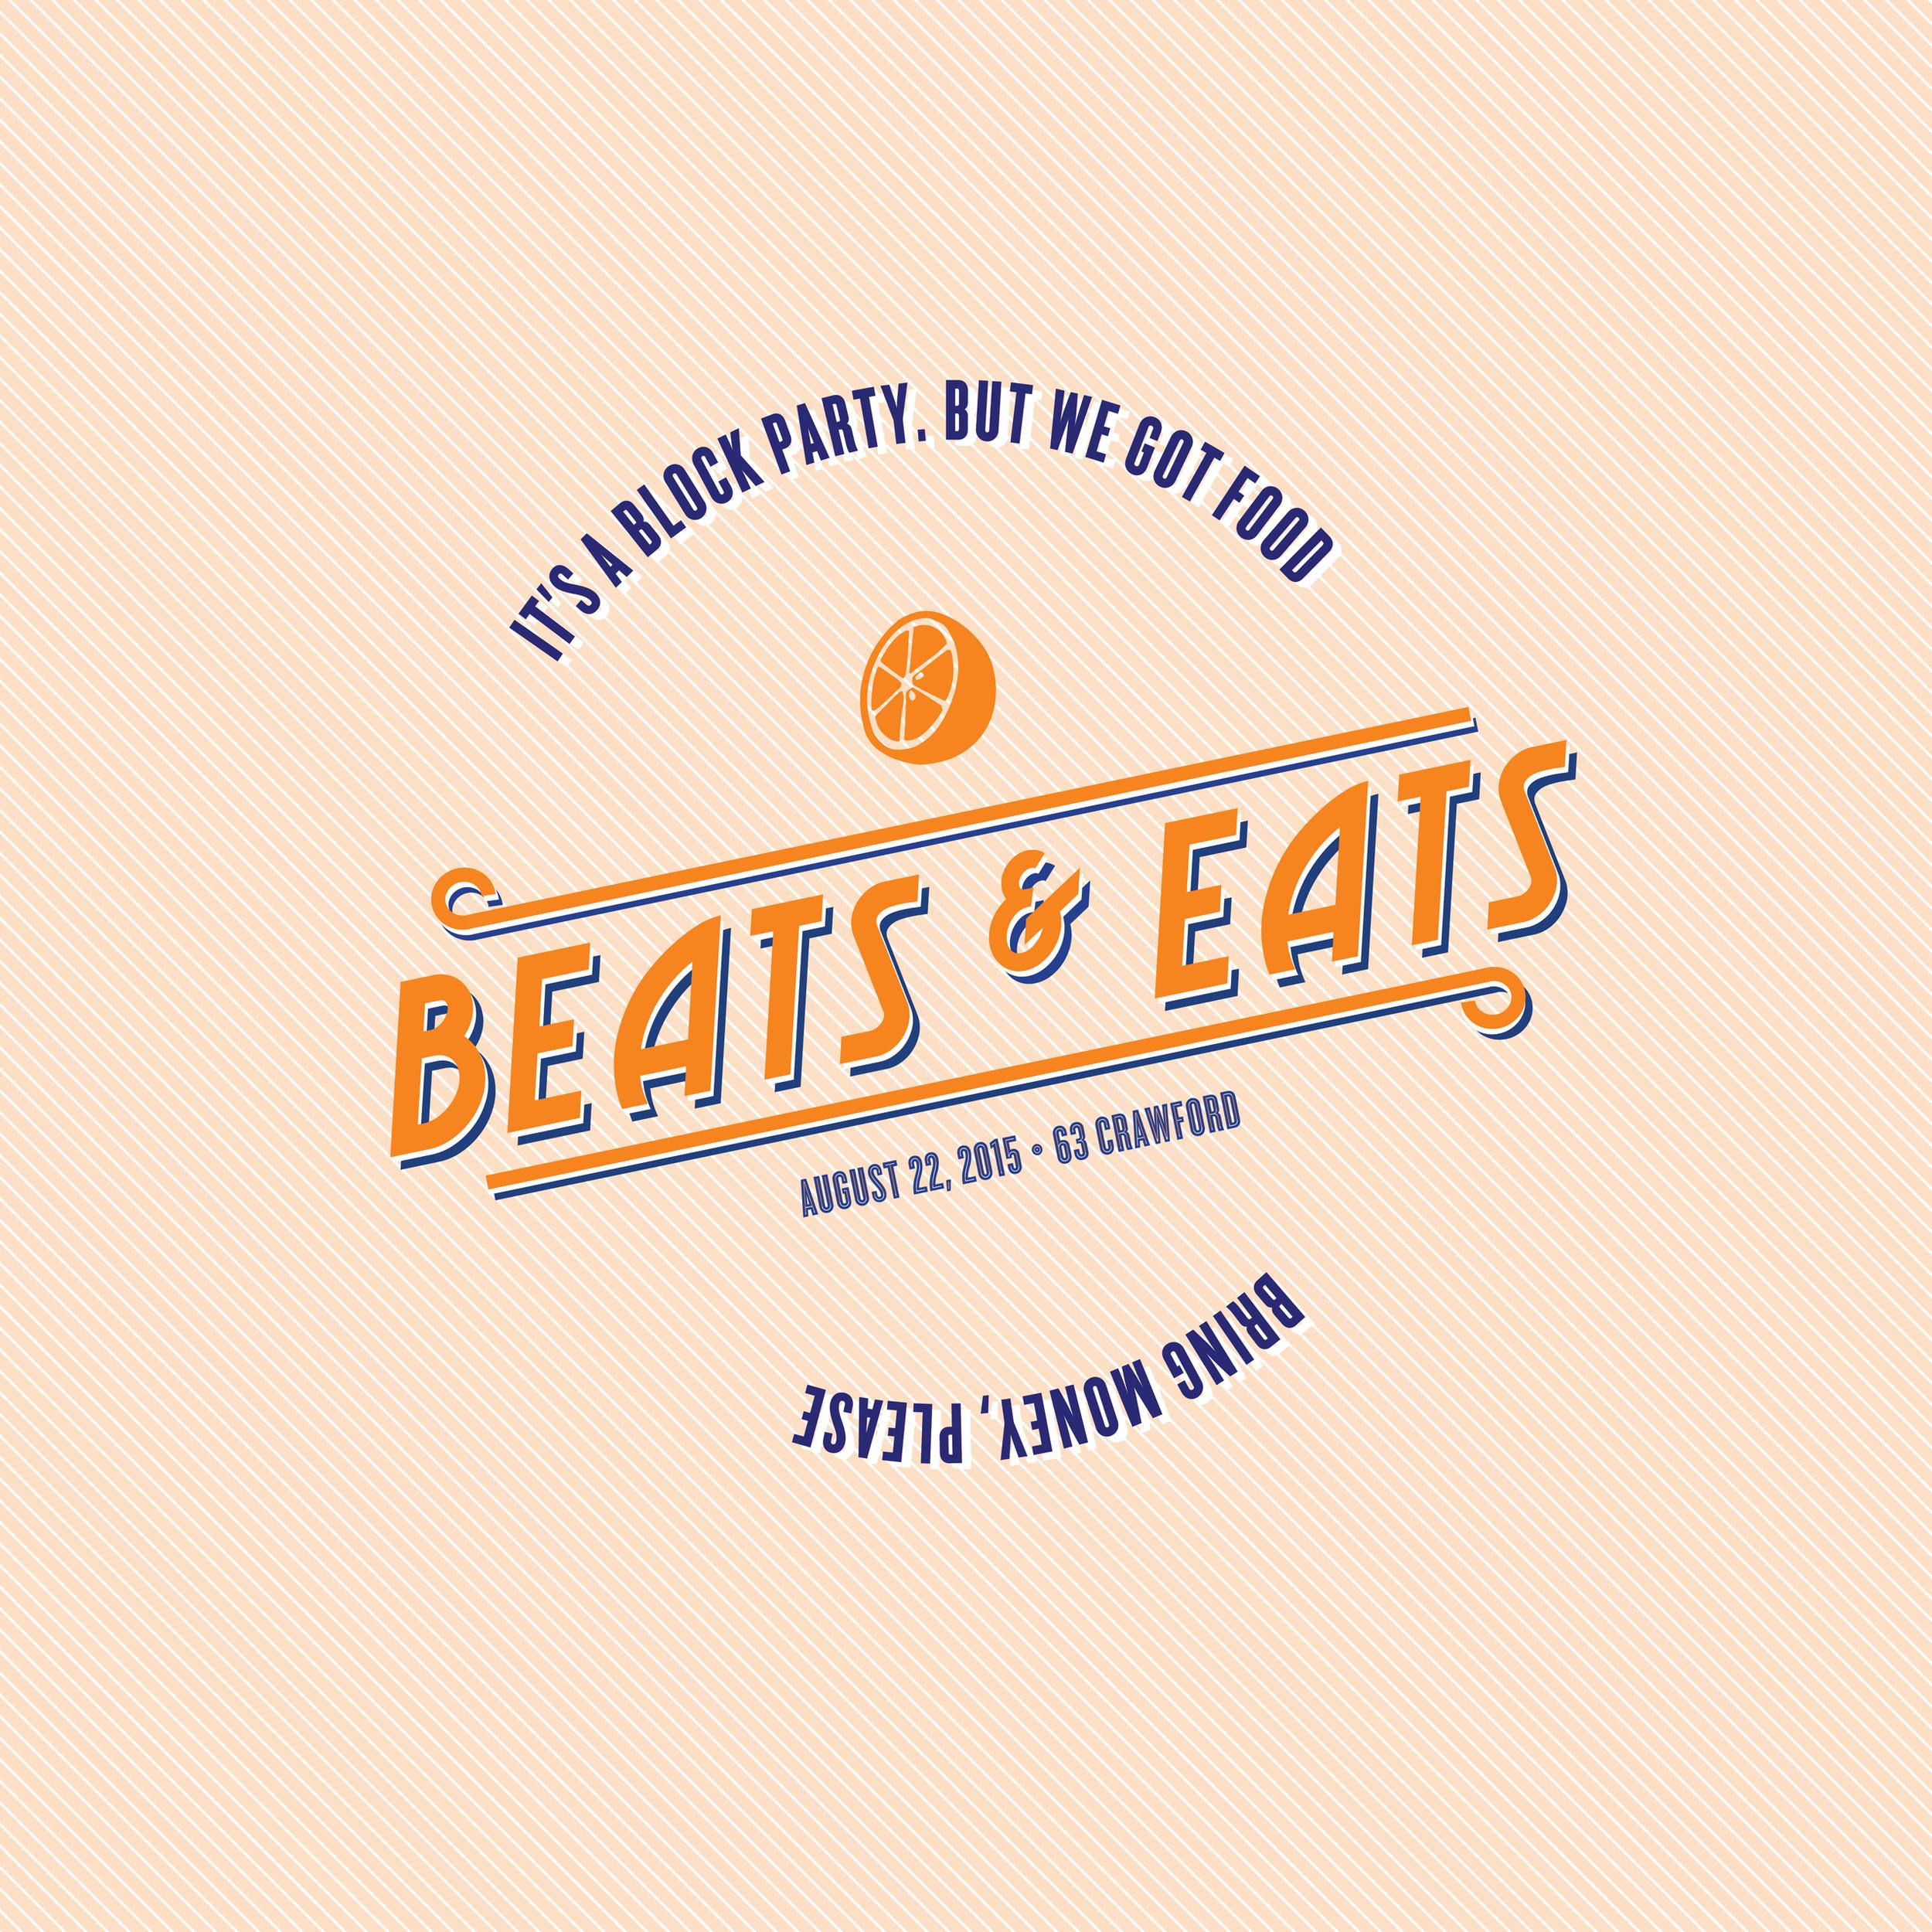 Beat&Eats.png